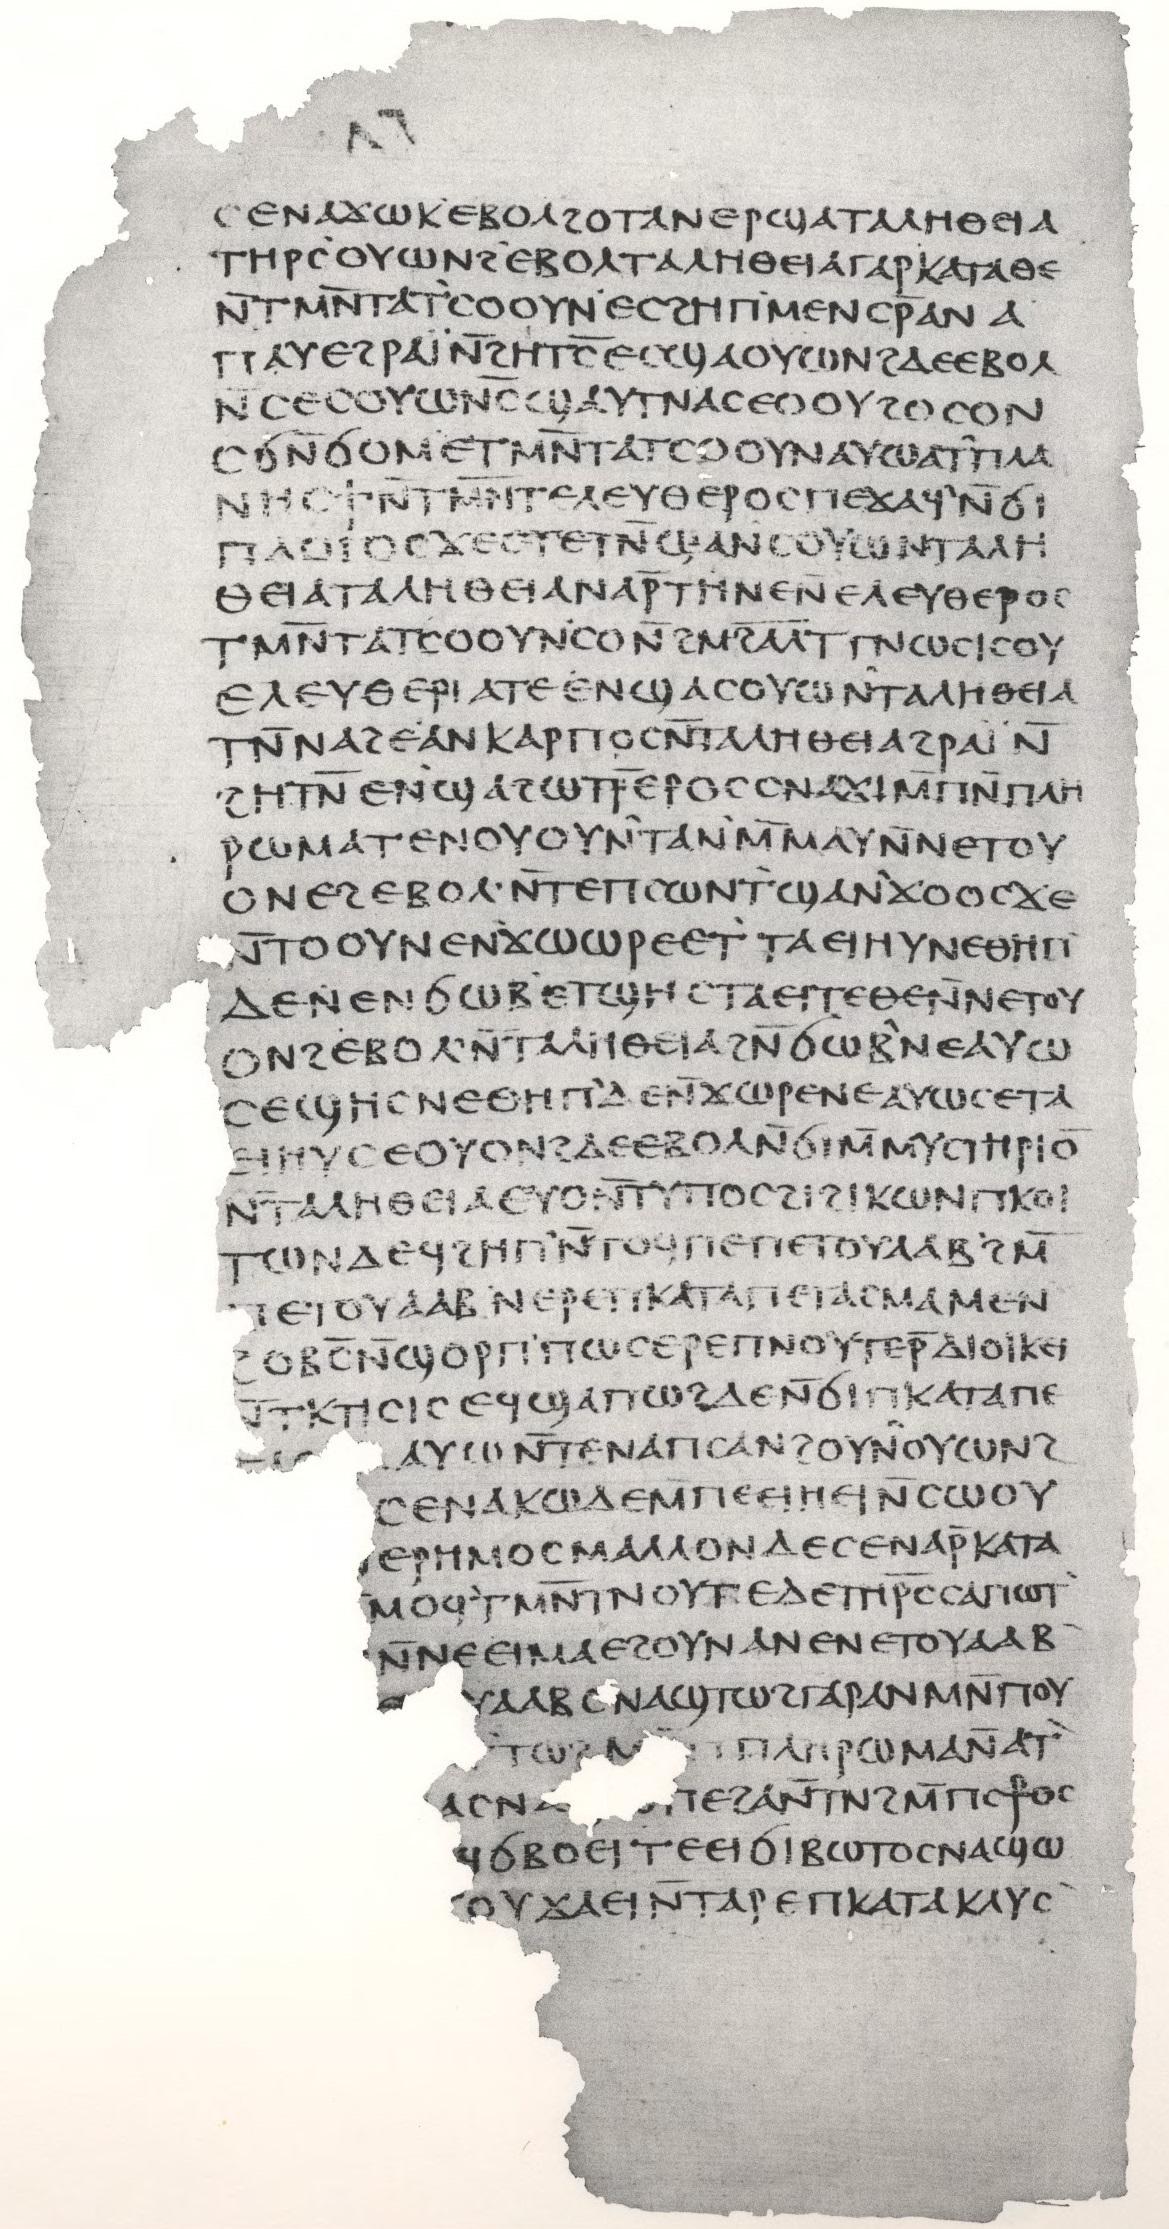 Gospel_of_Philip_facsimile_Page_84.jpg